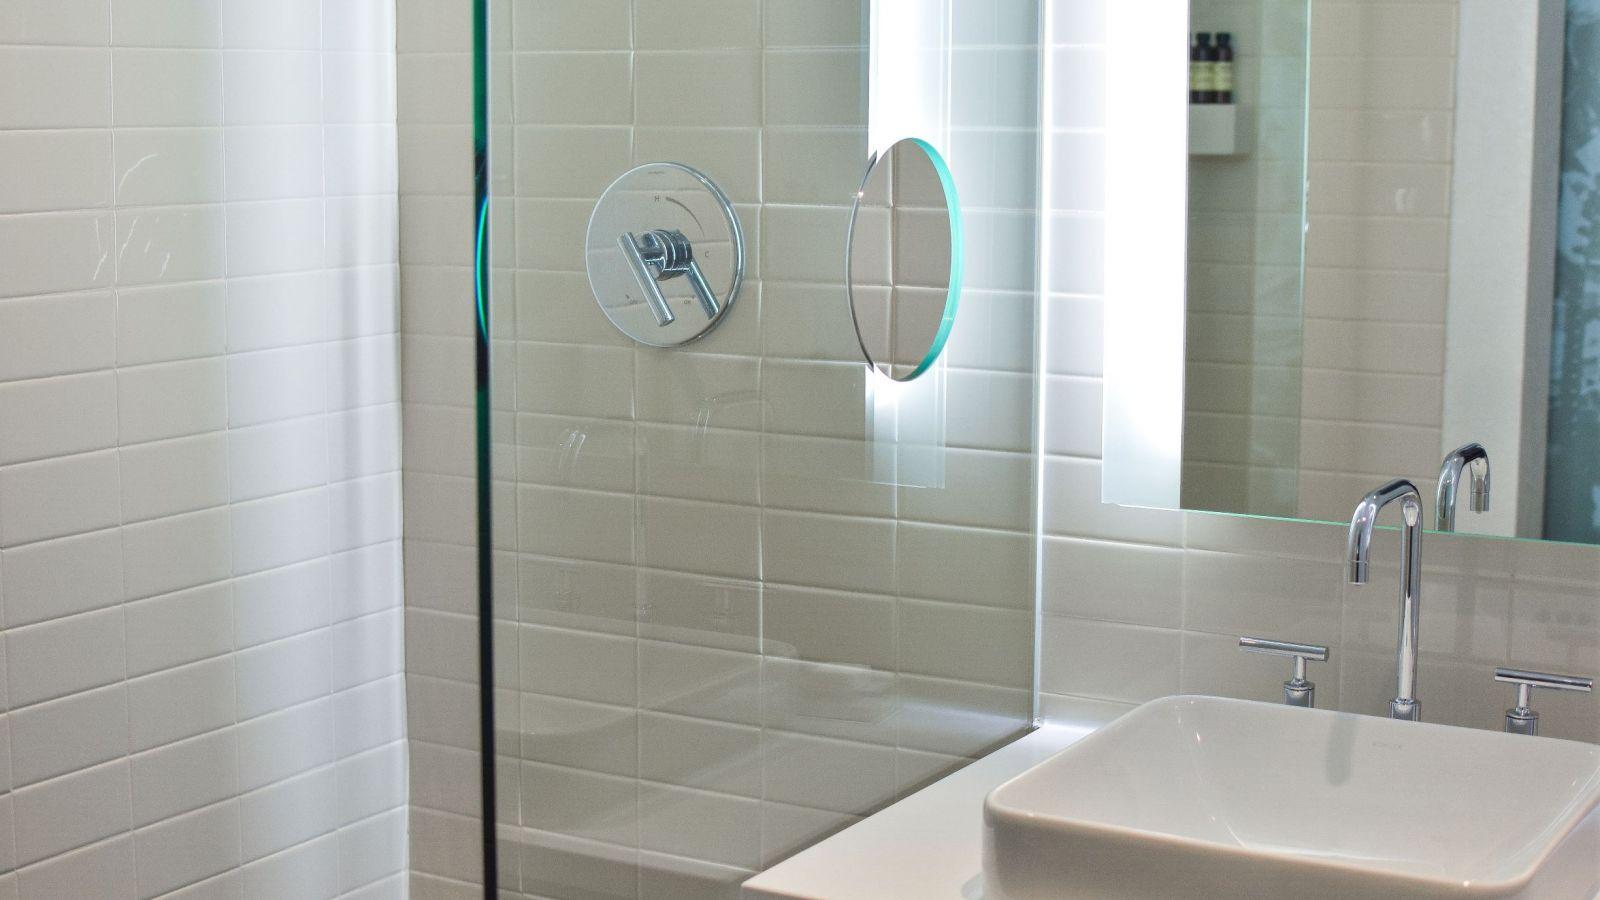 Bathroom Cleaning SOP Checklist